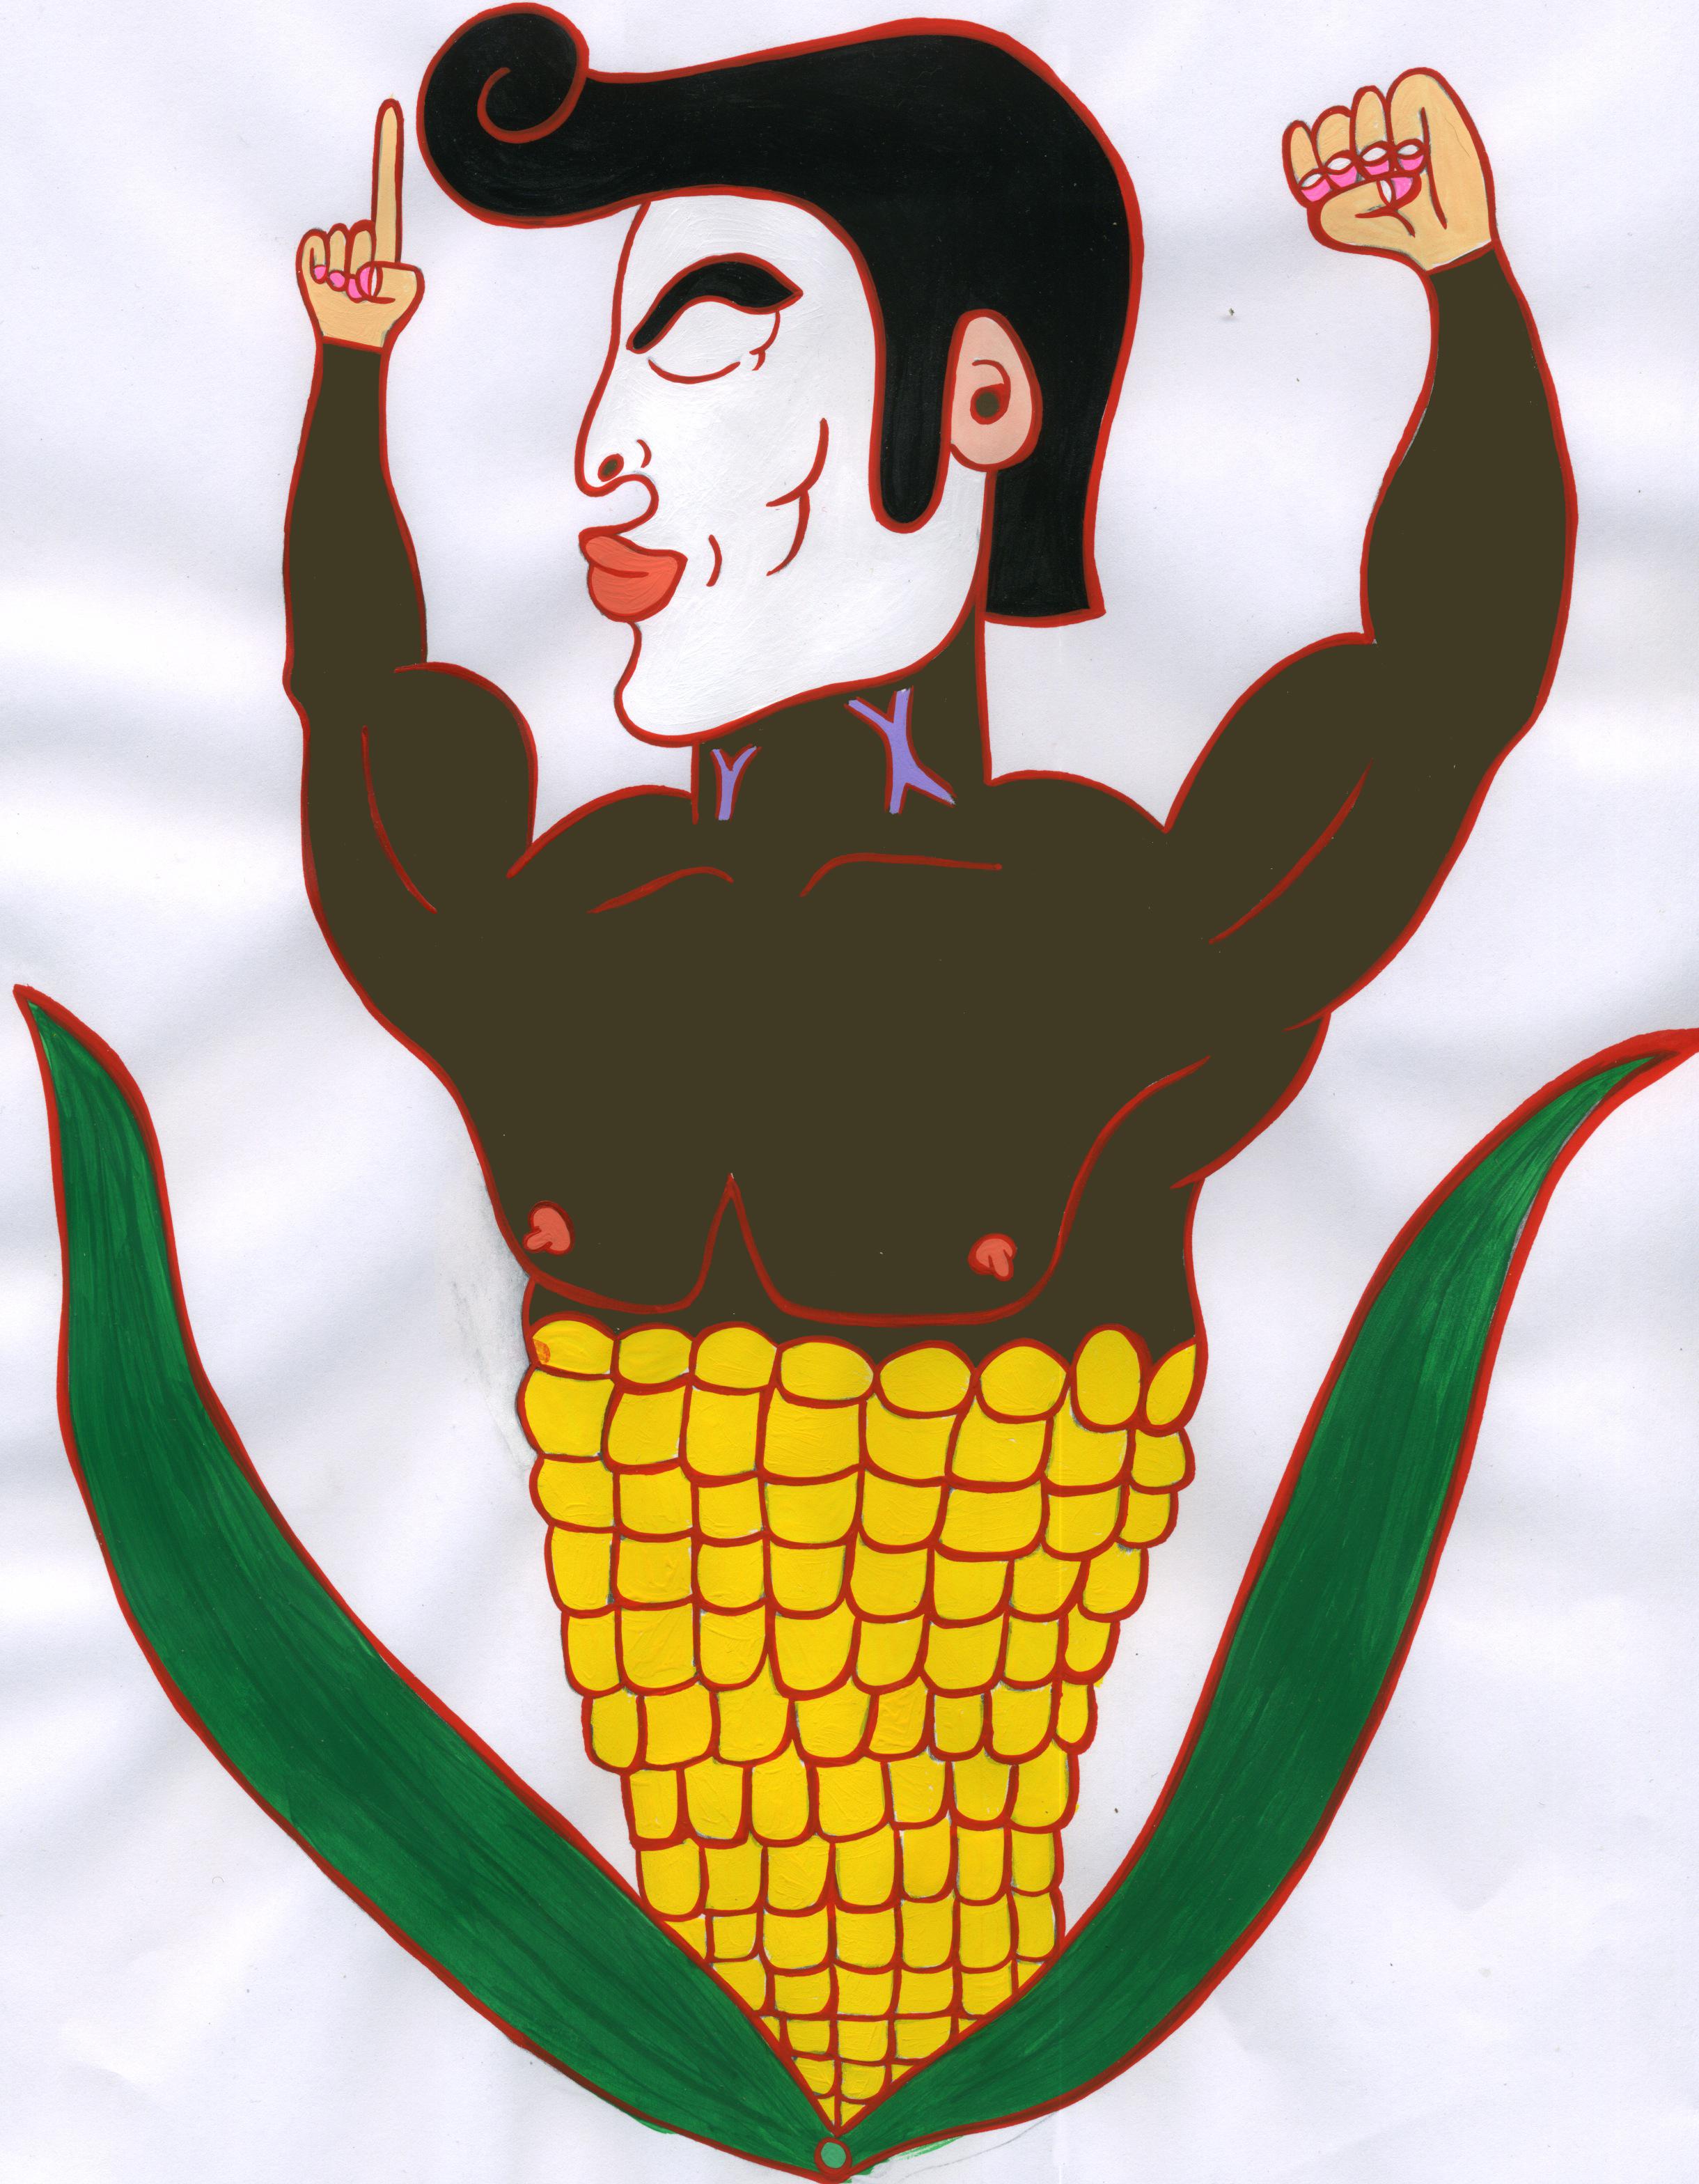 Cornpack